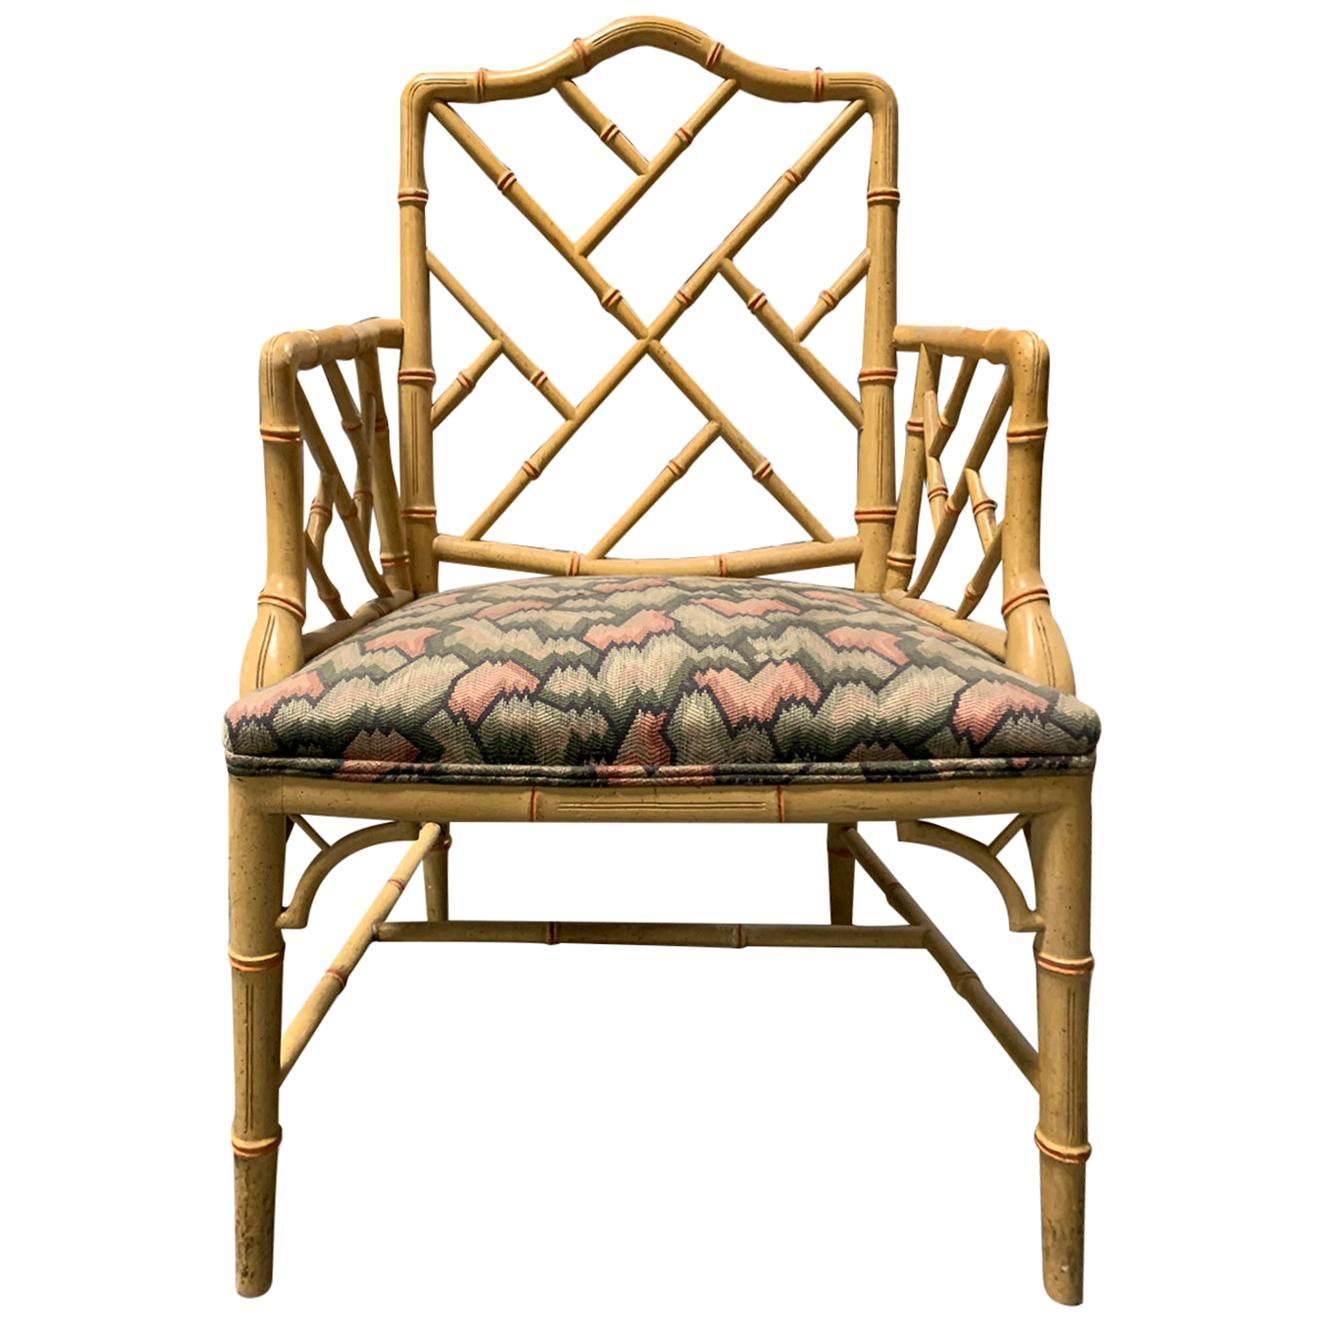 20th Century circa 1970s Italian Bamboo Fretwork Armchair